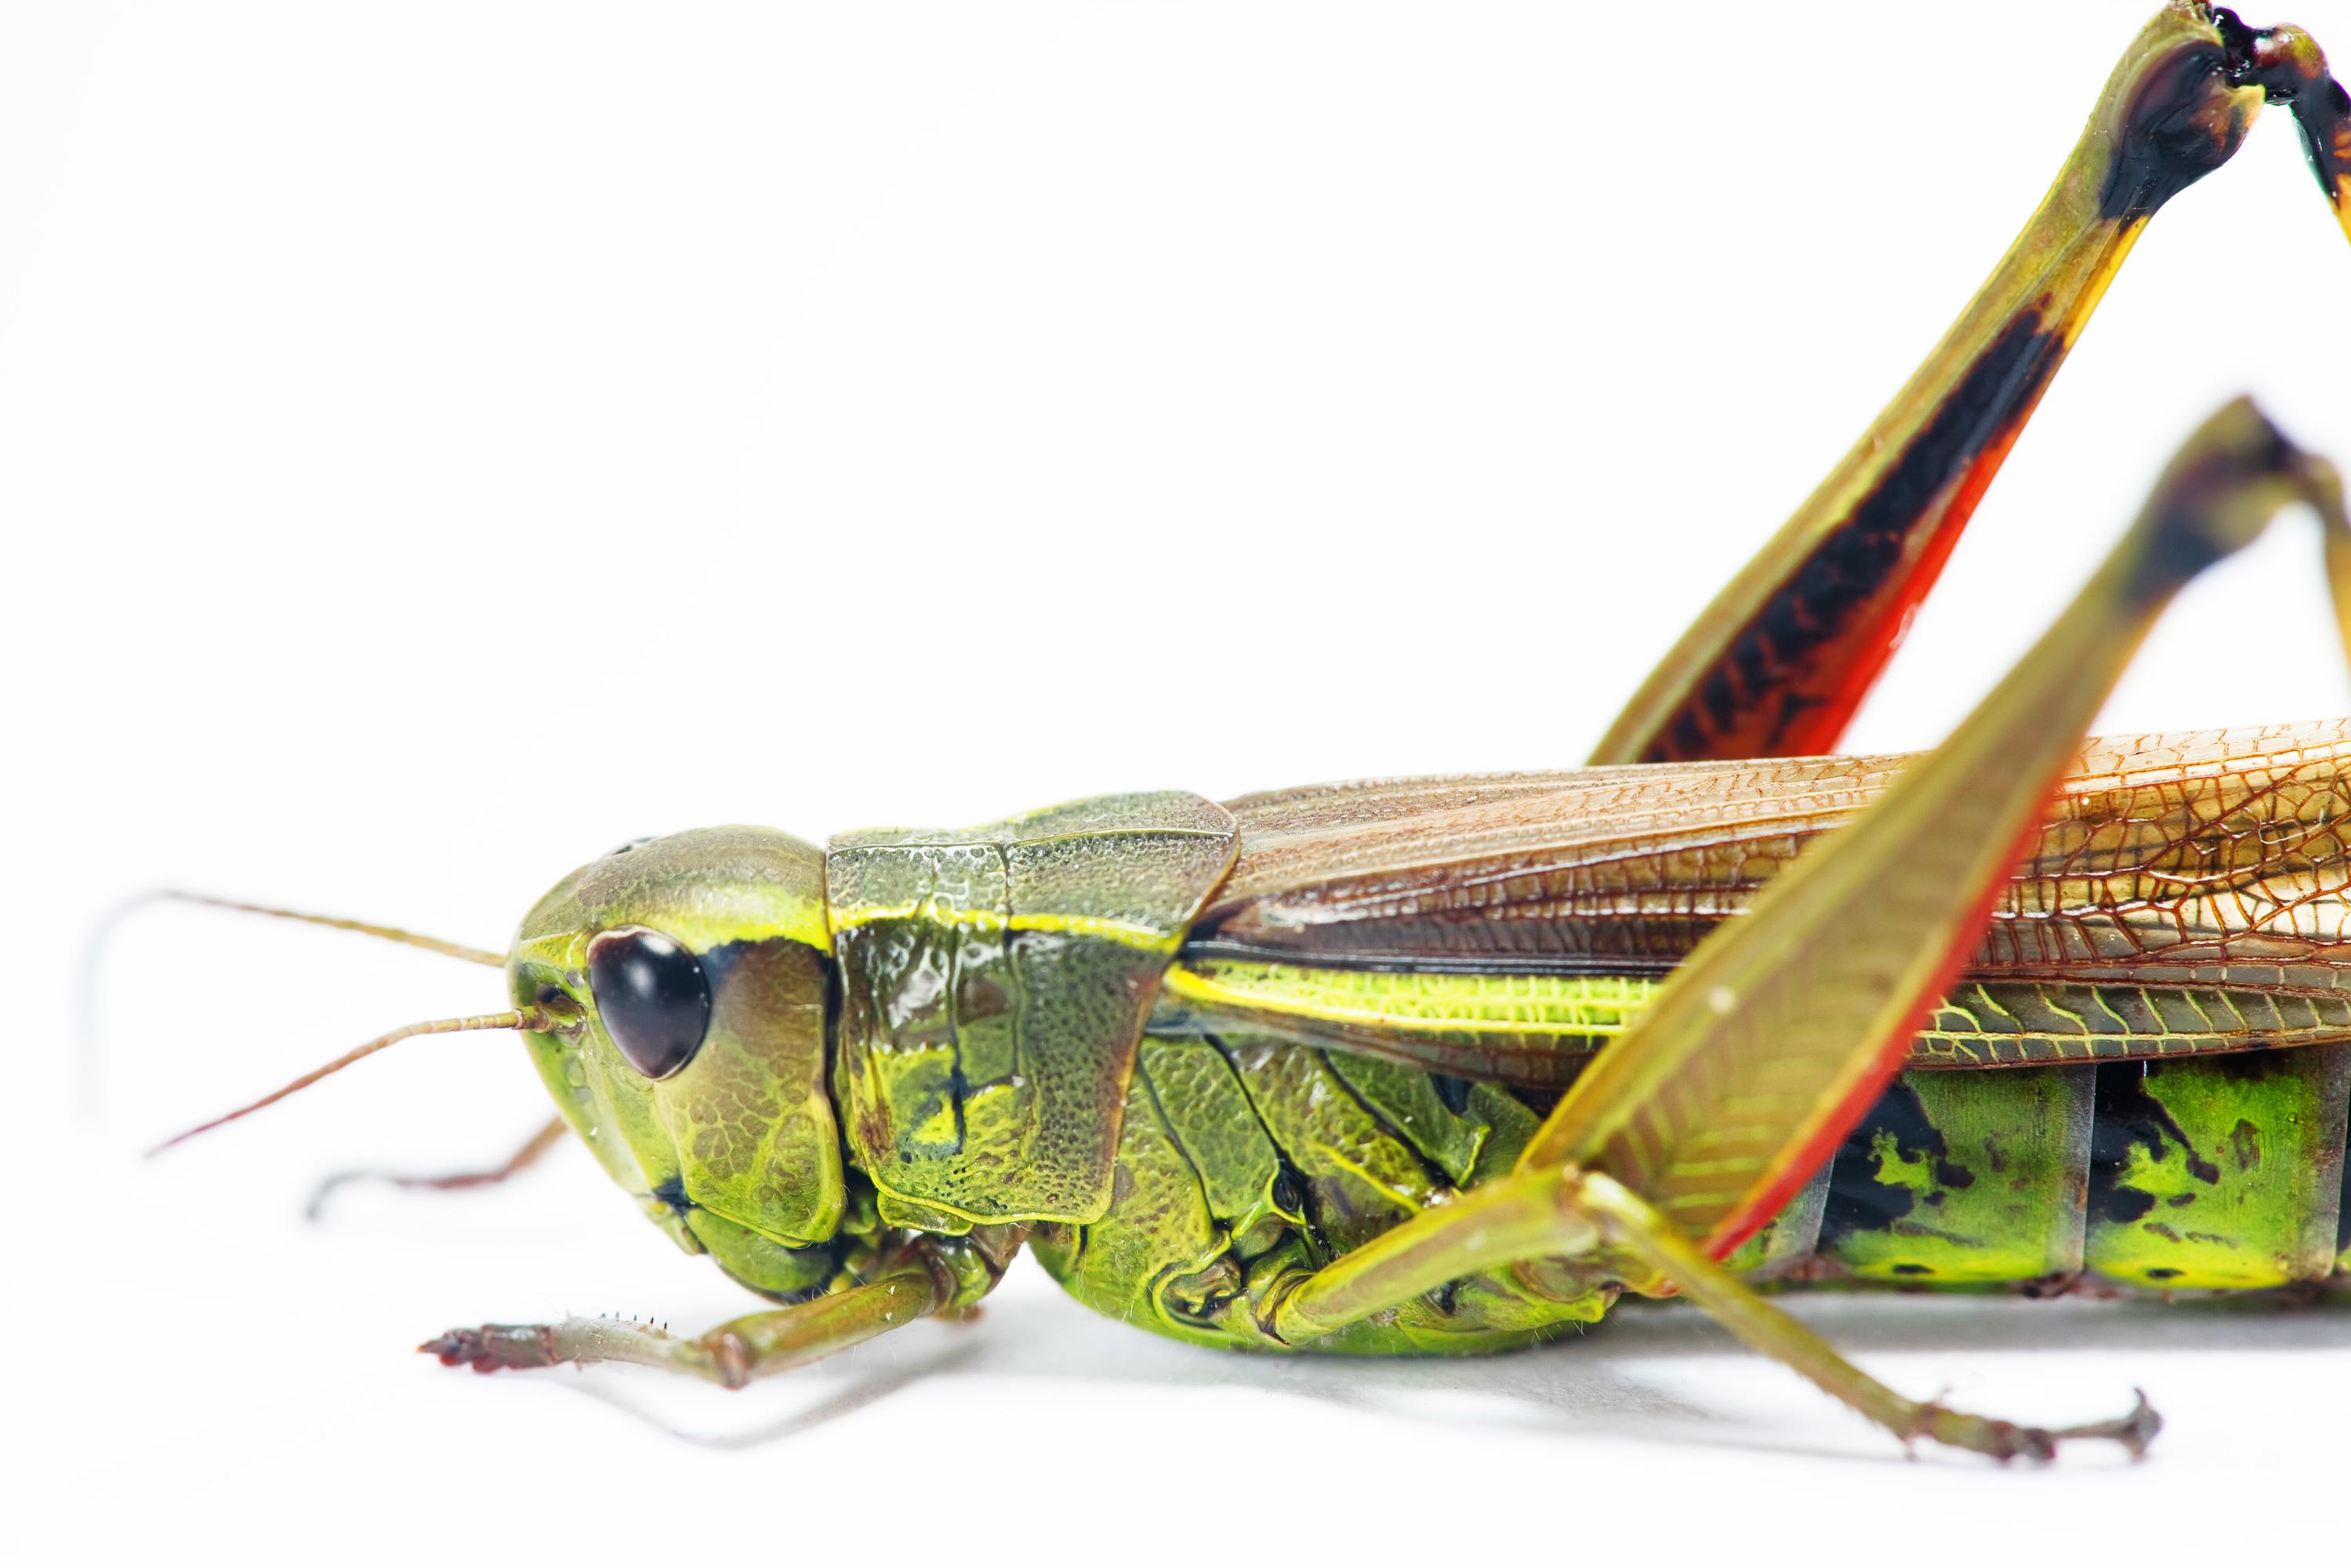 Grasshopper, Animal, Antenna, Bug, Copyspace, HQ Photo